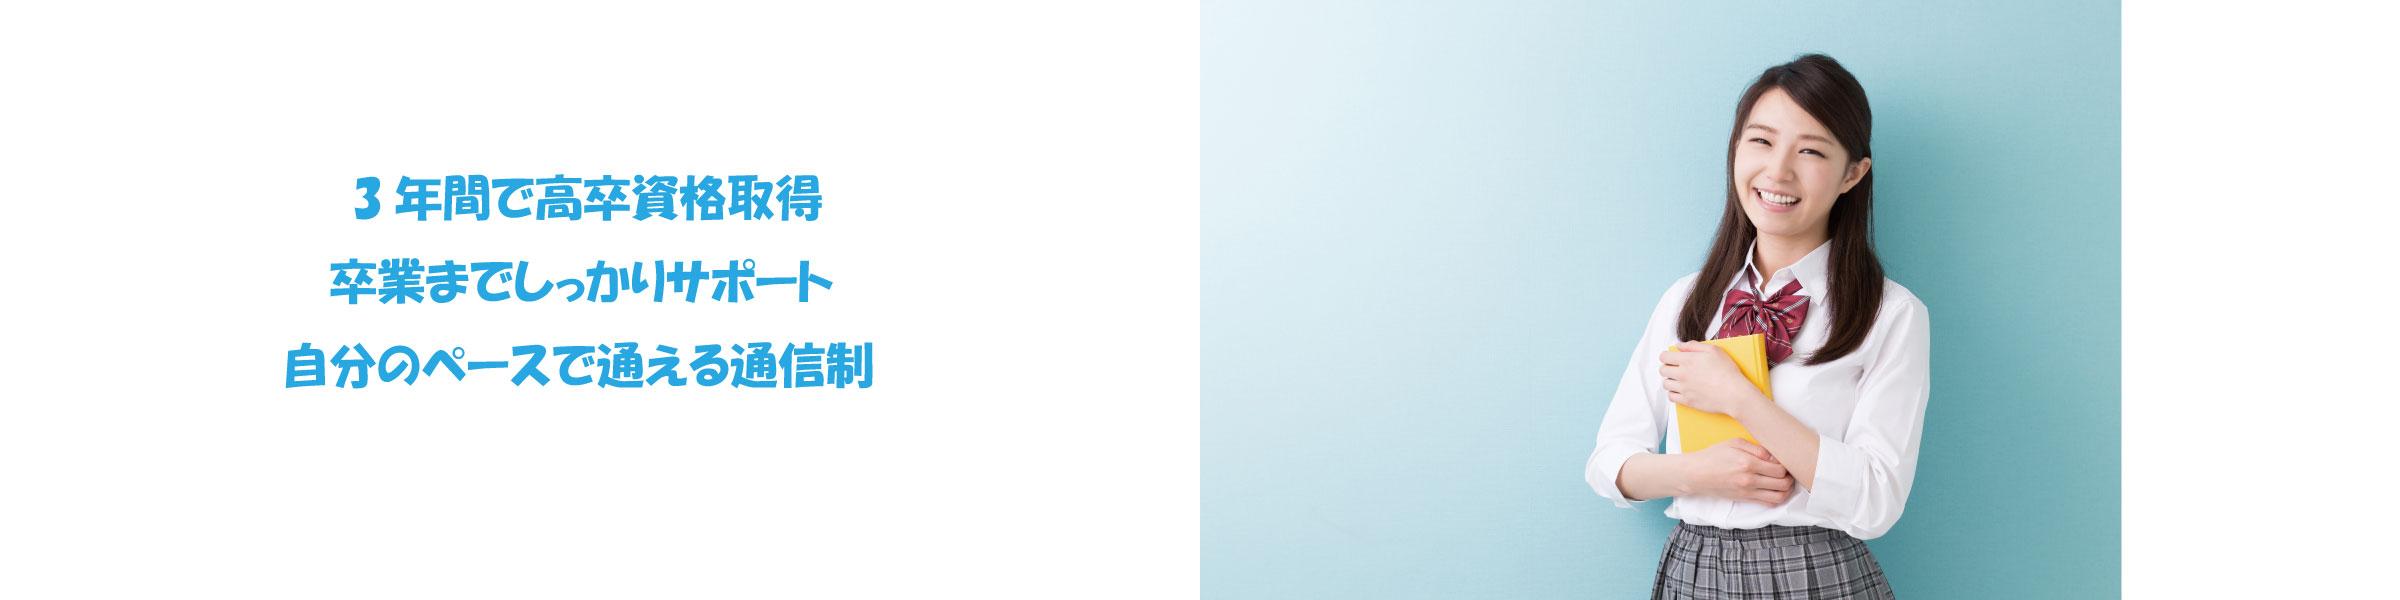 鹿島学園通信制連携サポート校